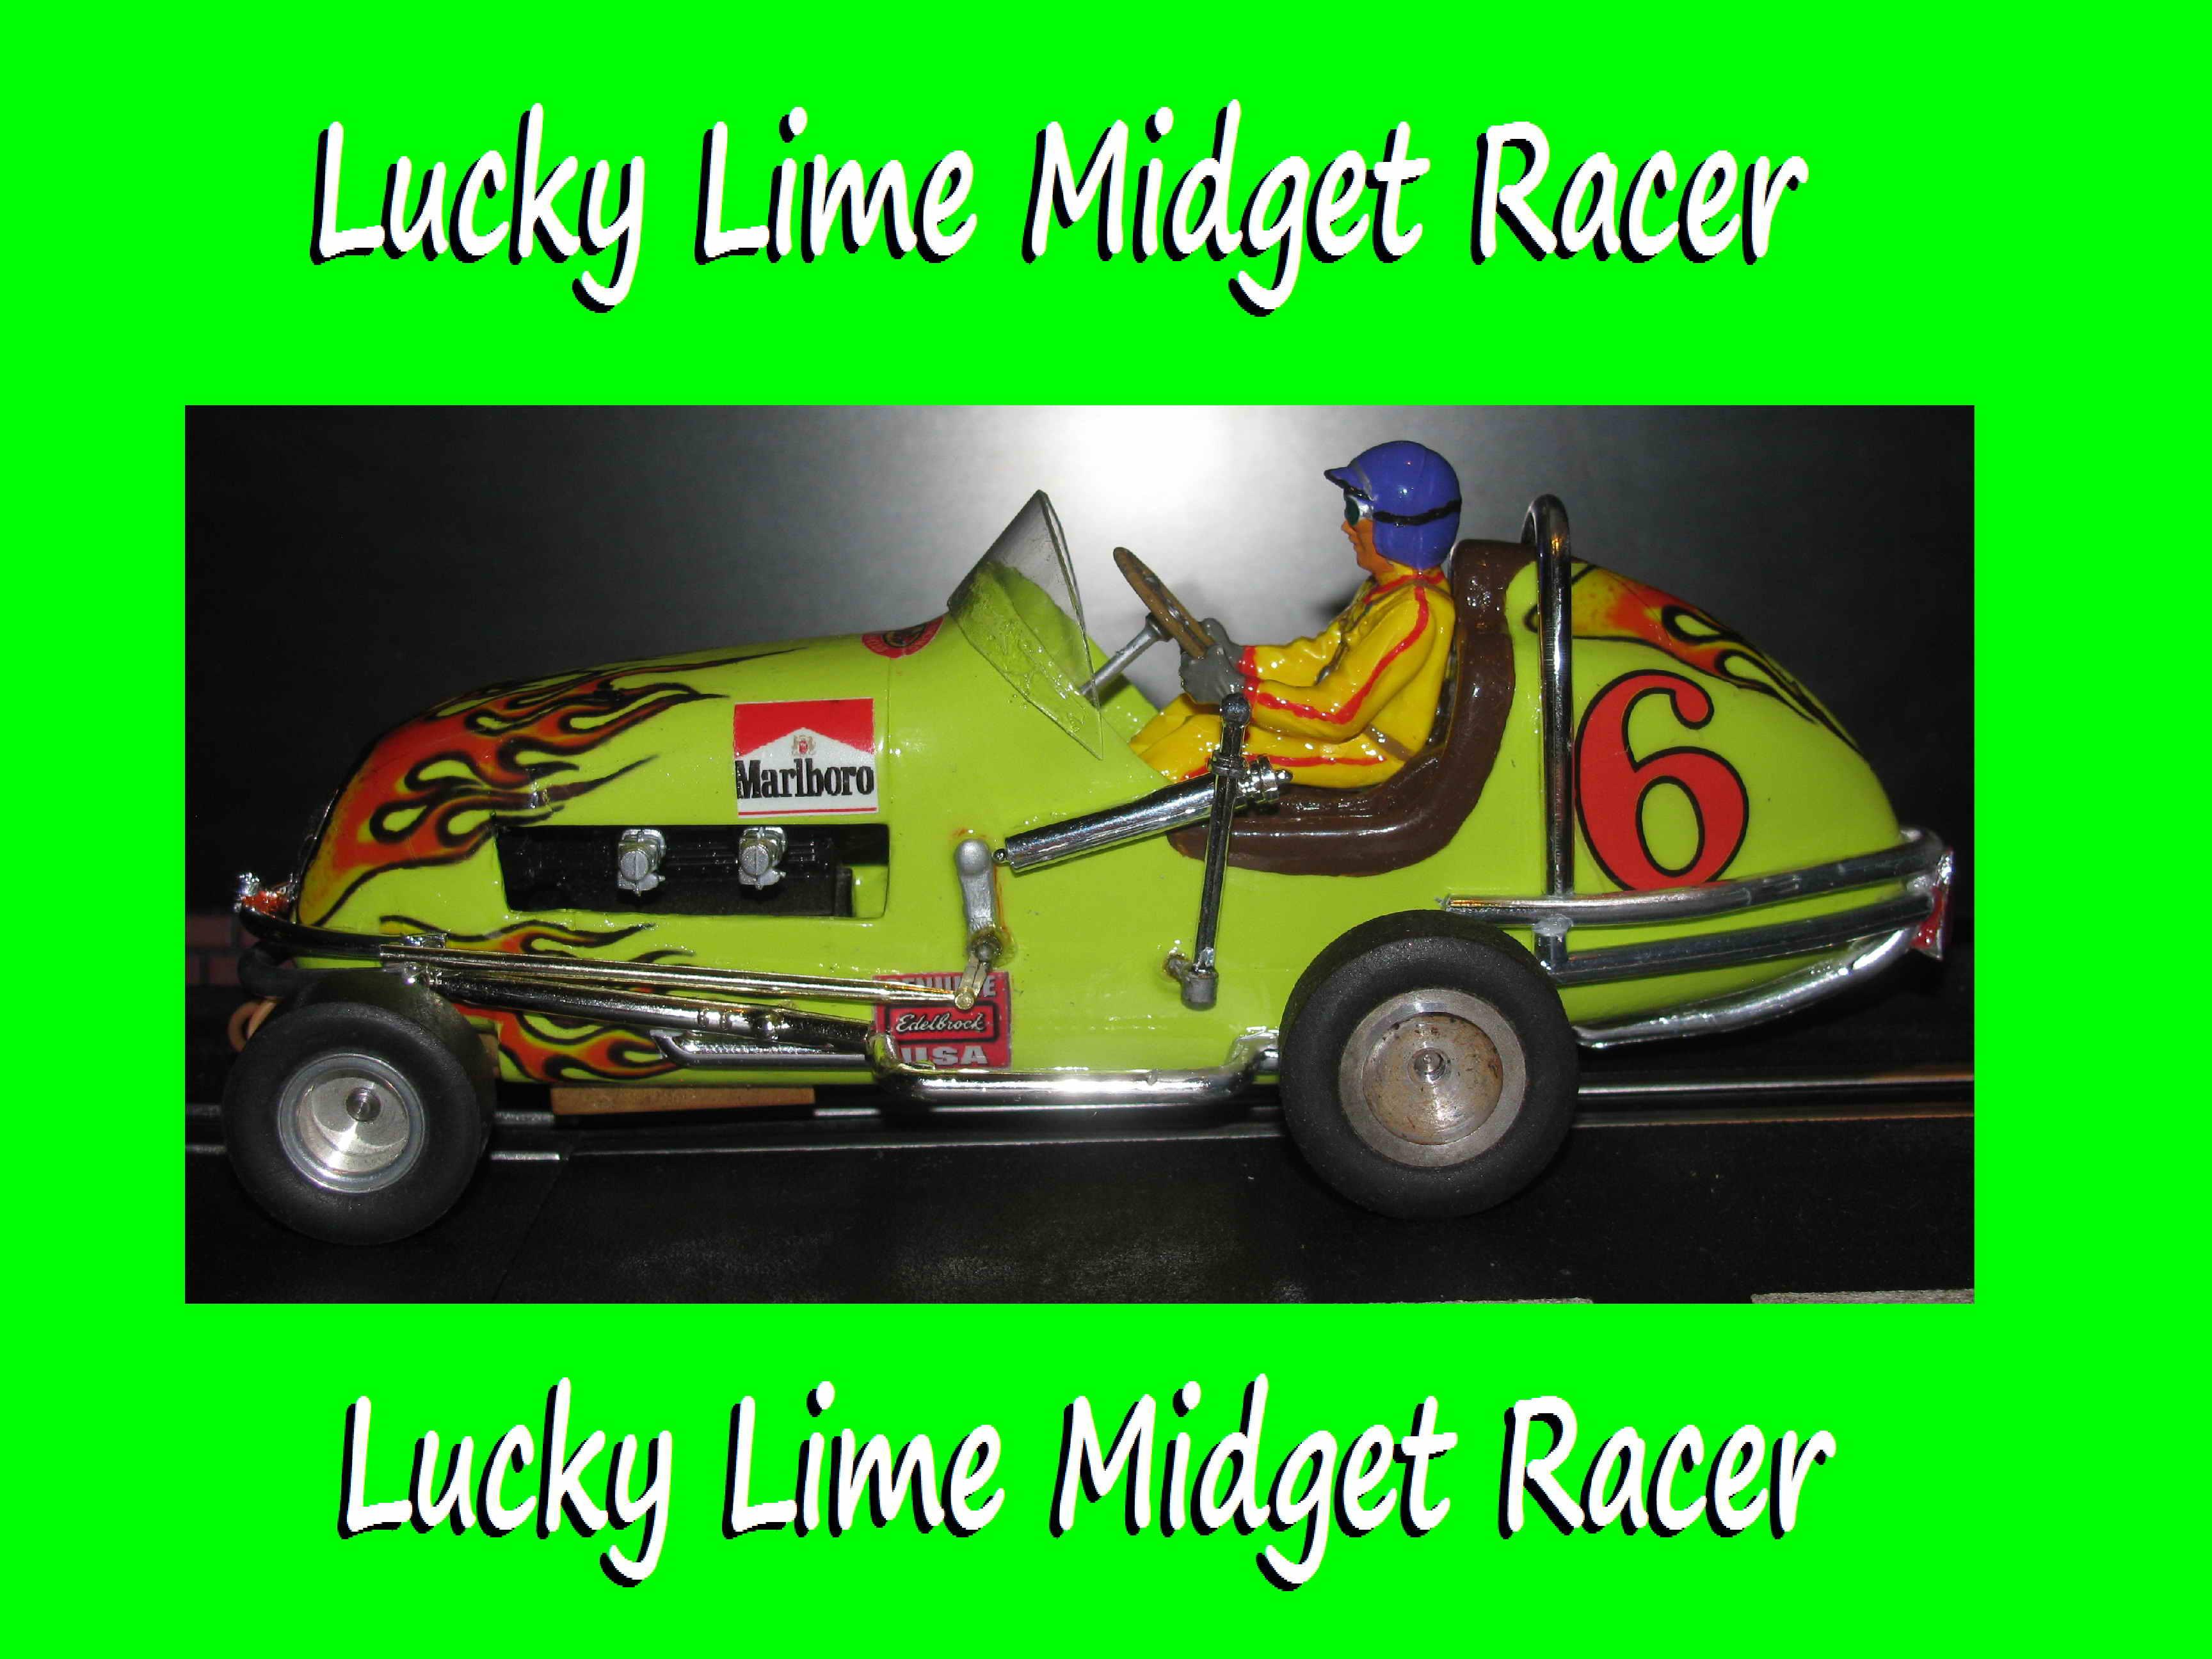 *SOLD* Vintage Monogram Midget Racer Lucky Lime Slot Car